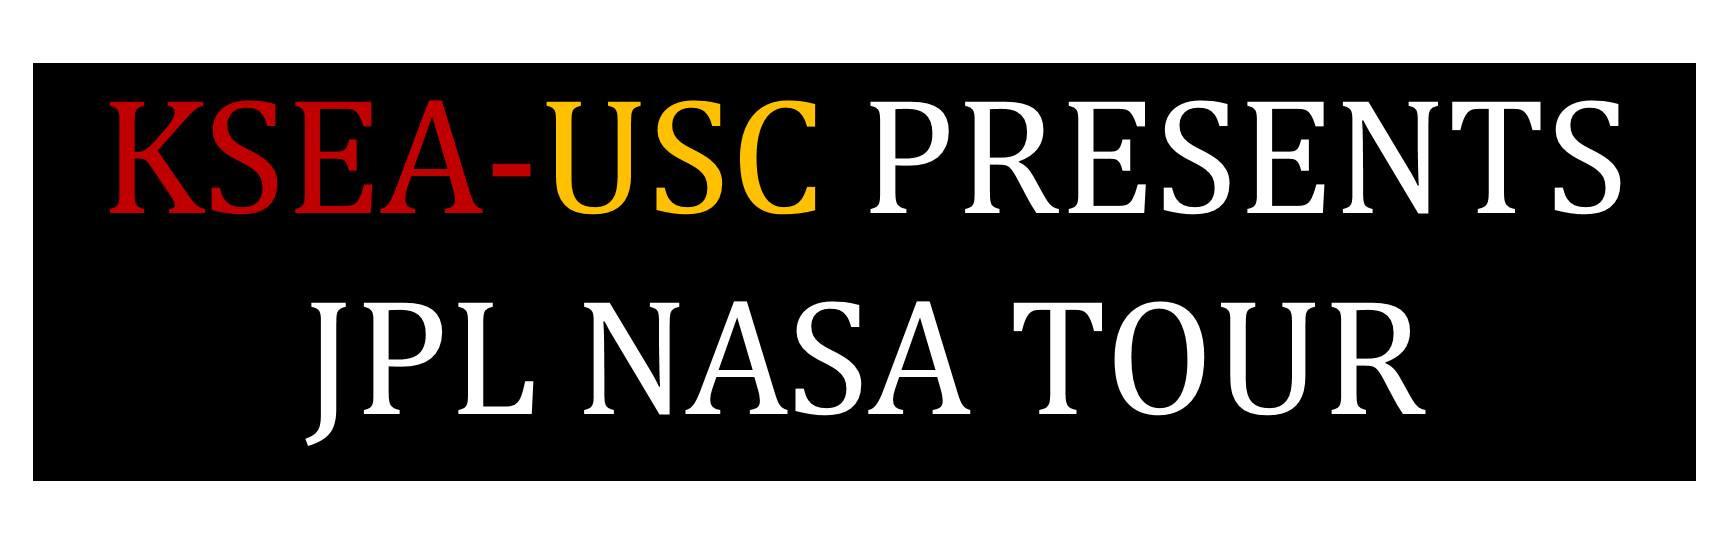 20140421_JPL NASA.jpg